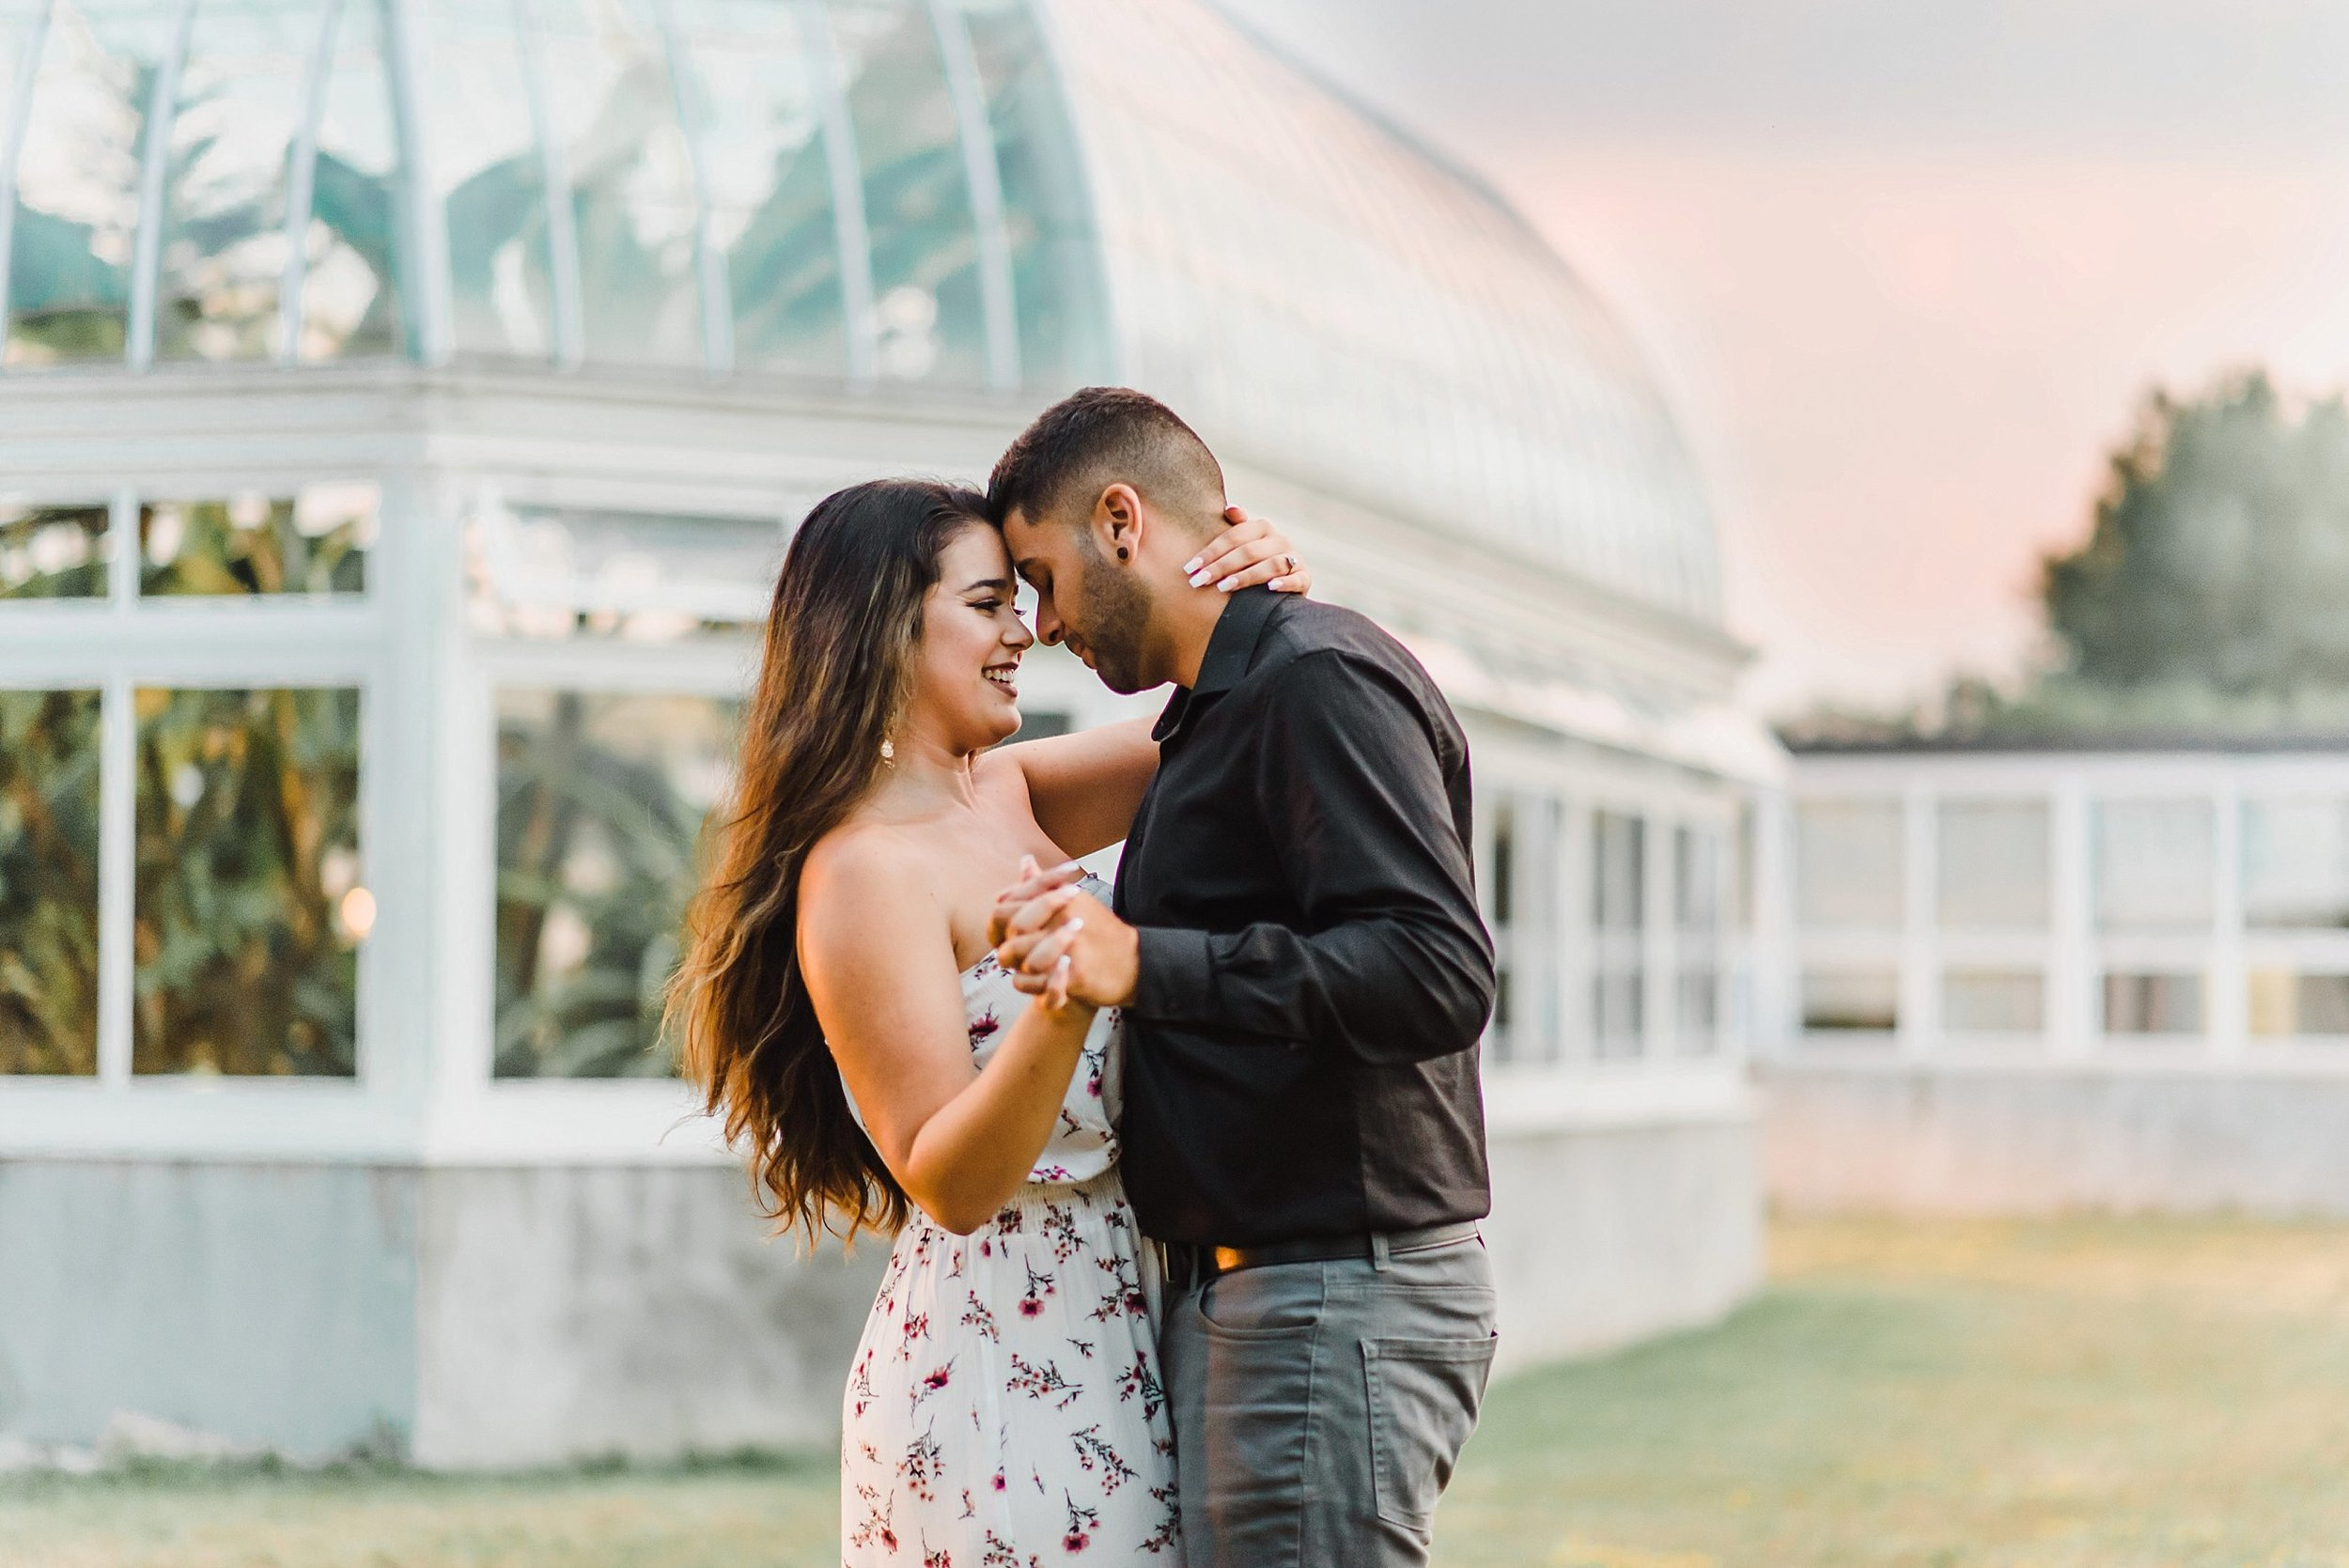 light airy indie fine art ottawa wedding photographer | Ali and Batoul Photography_0985.jpg